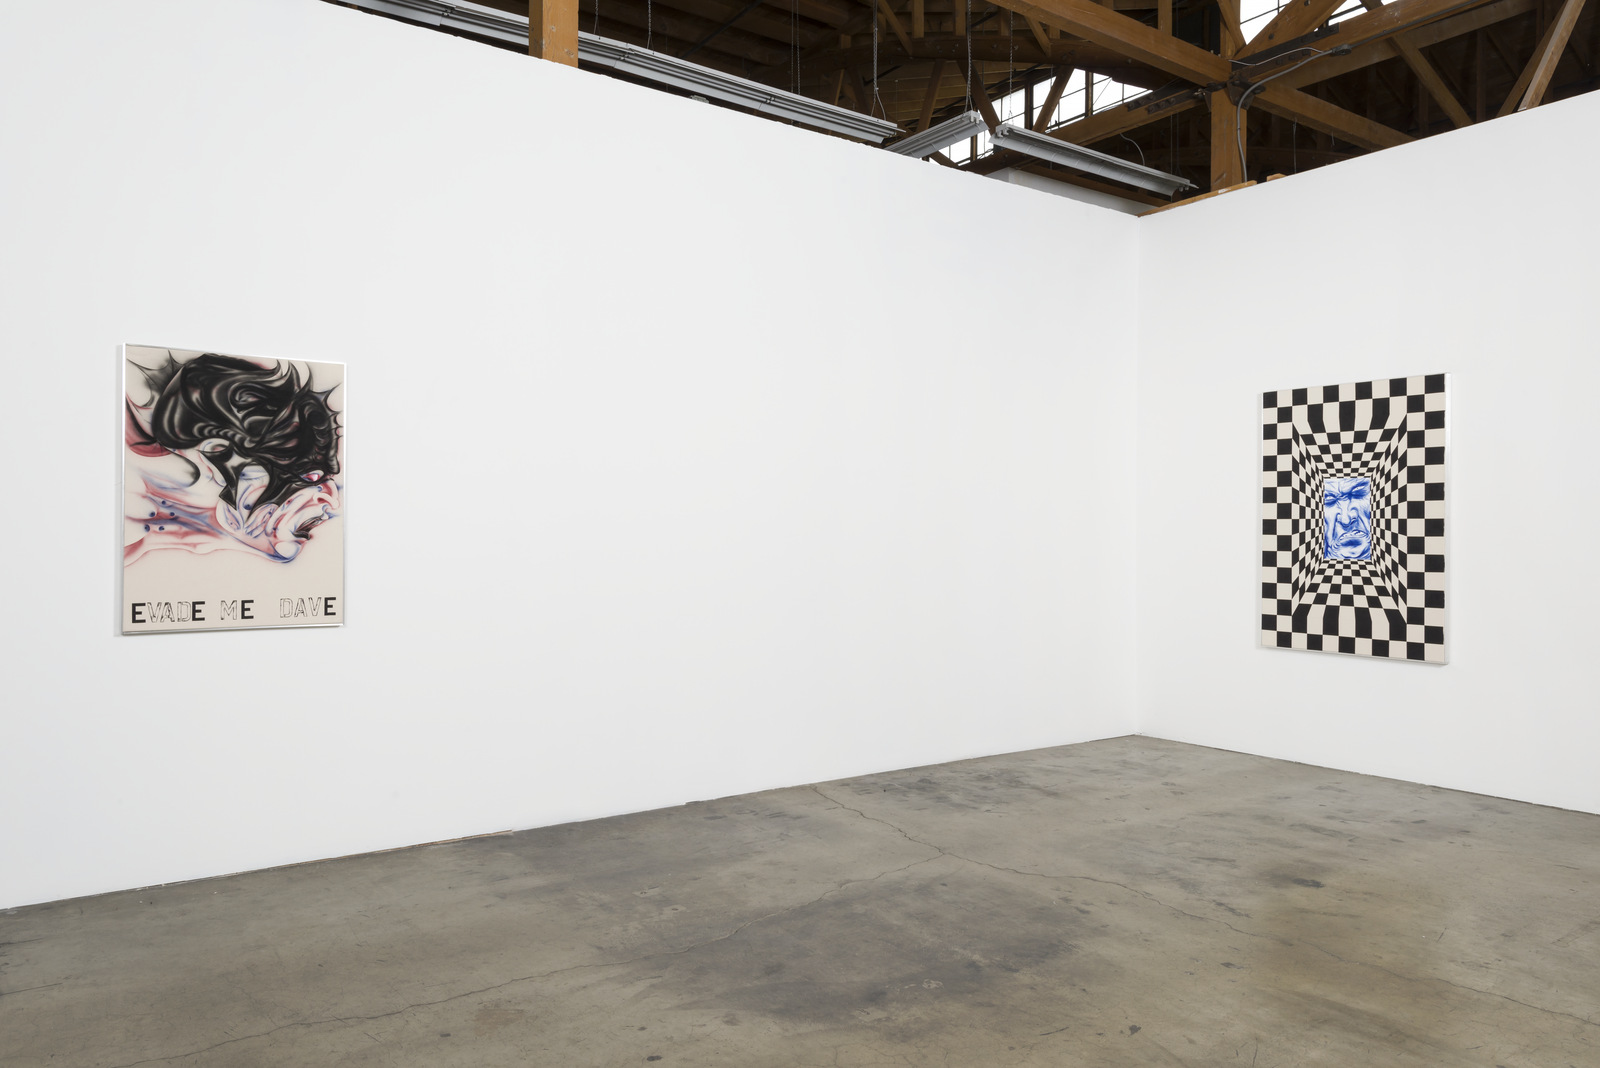 3_Installation View, Zoe Barcza, DR AWKWARD, Ghebaly Gallery